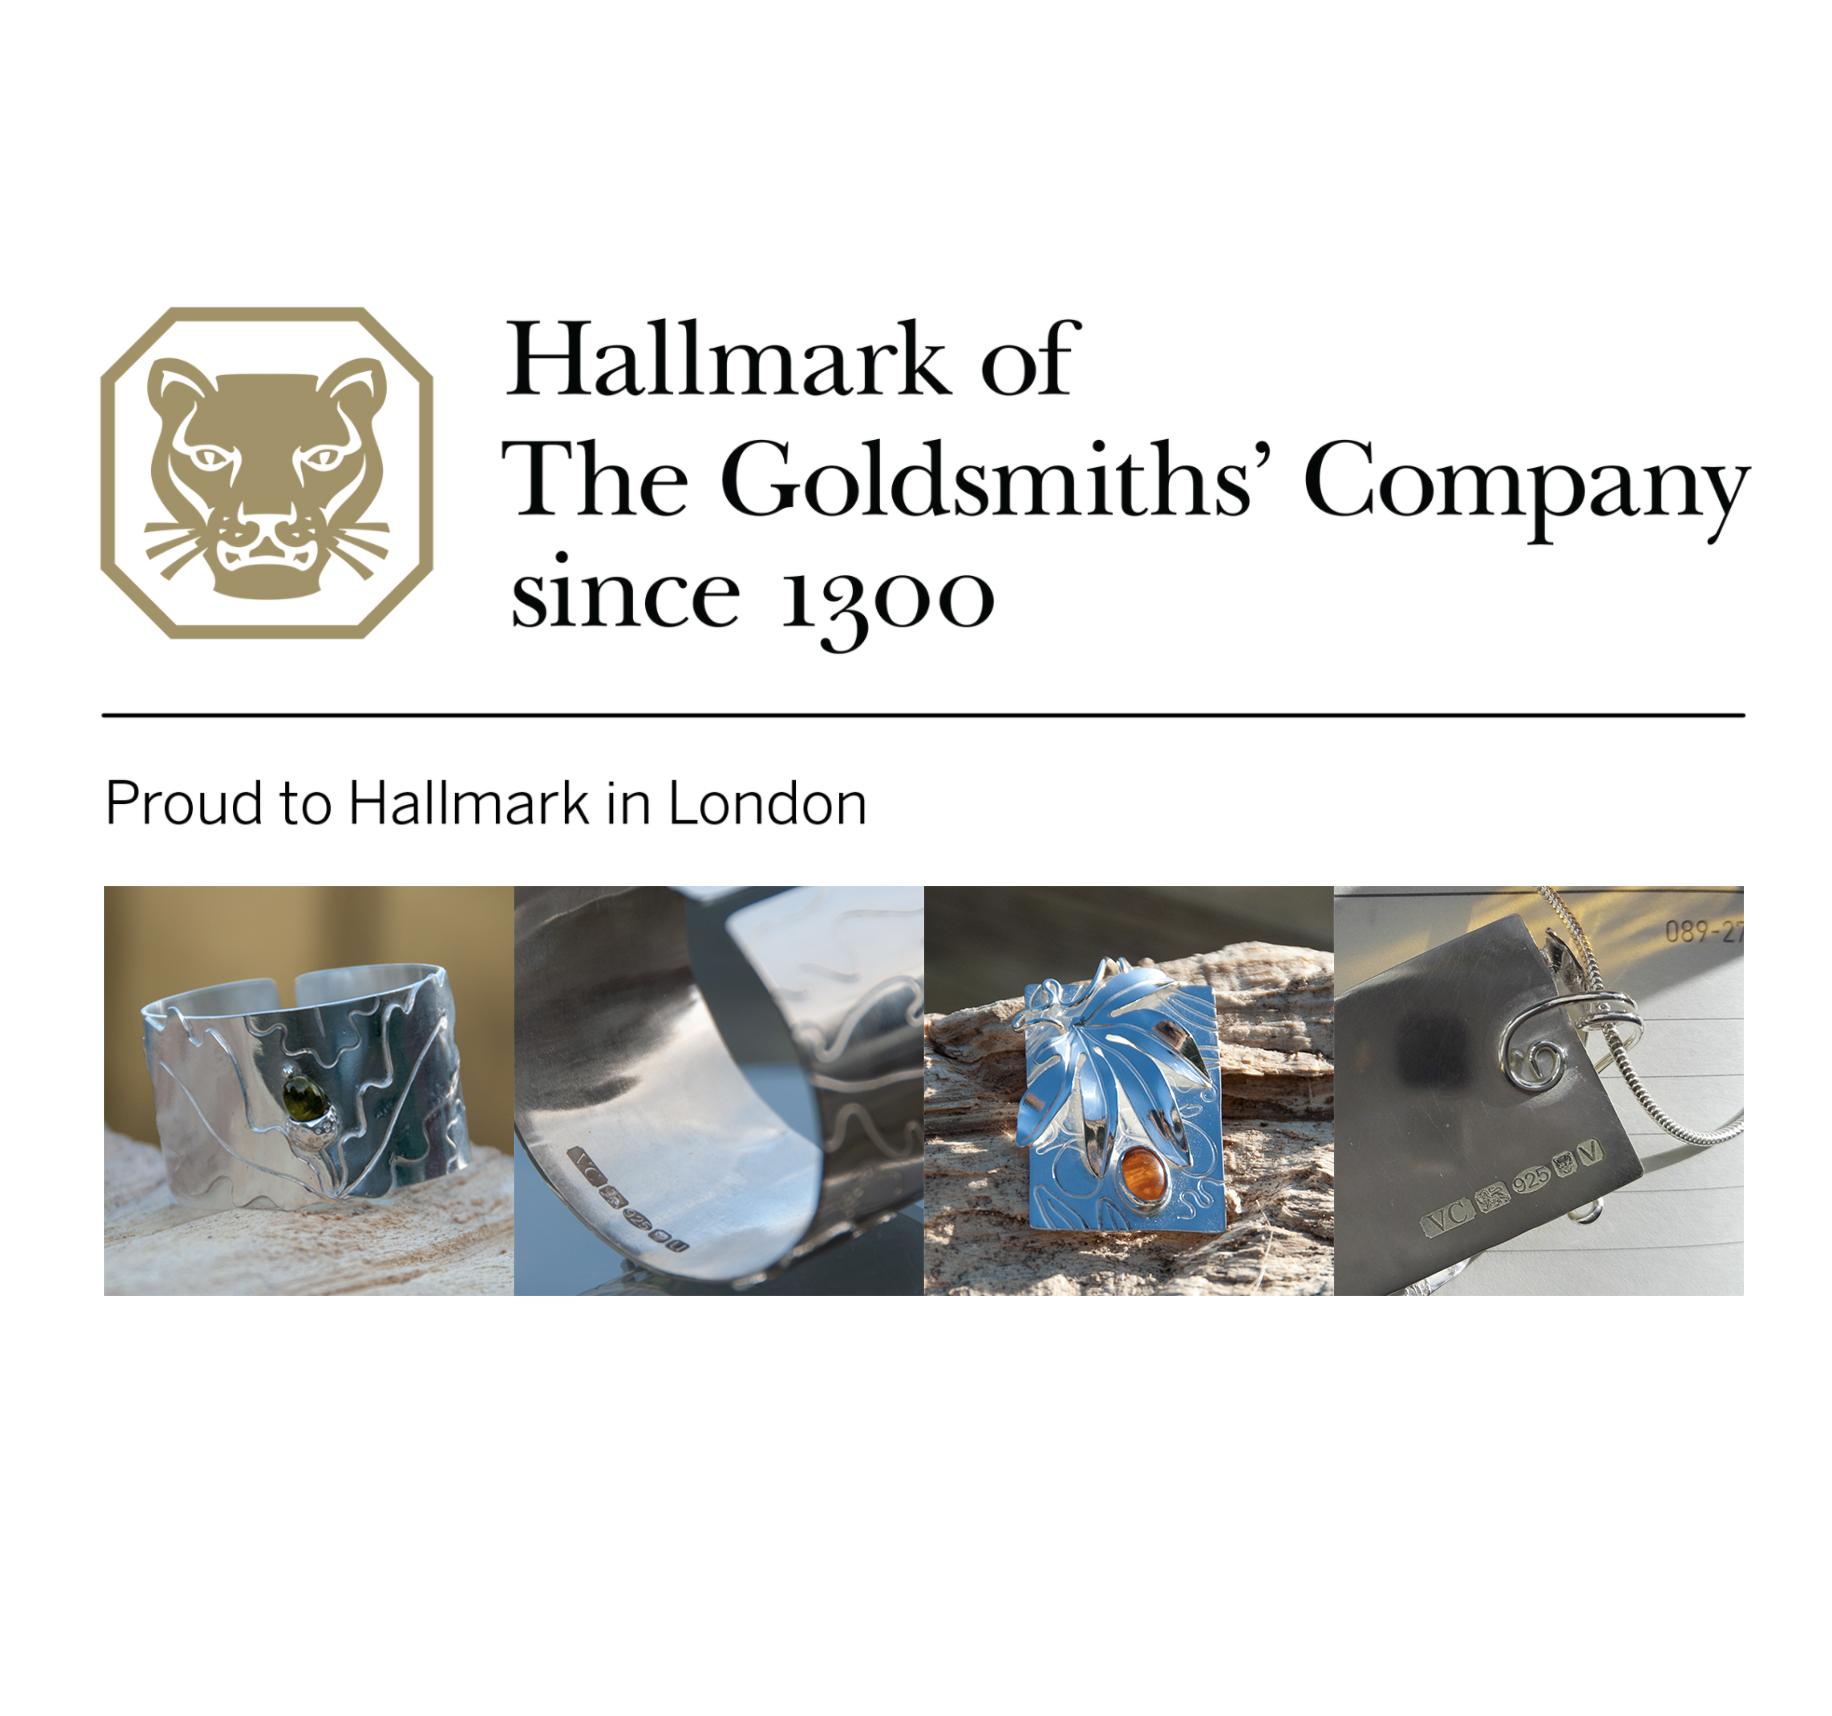 Why Hallmark